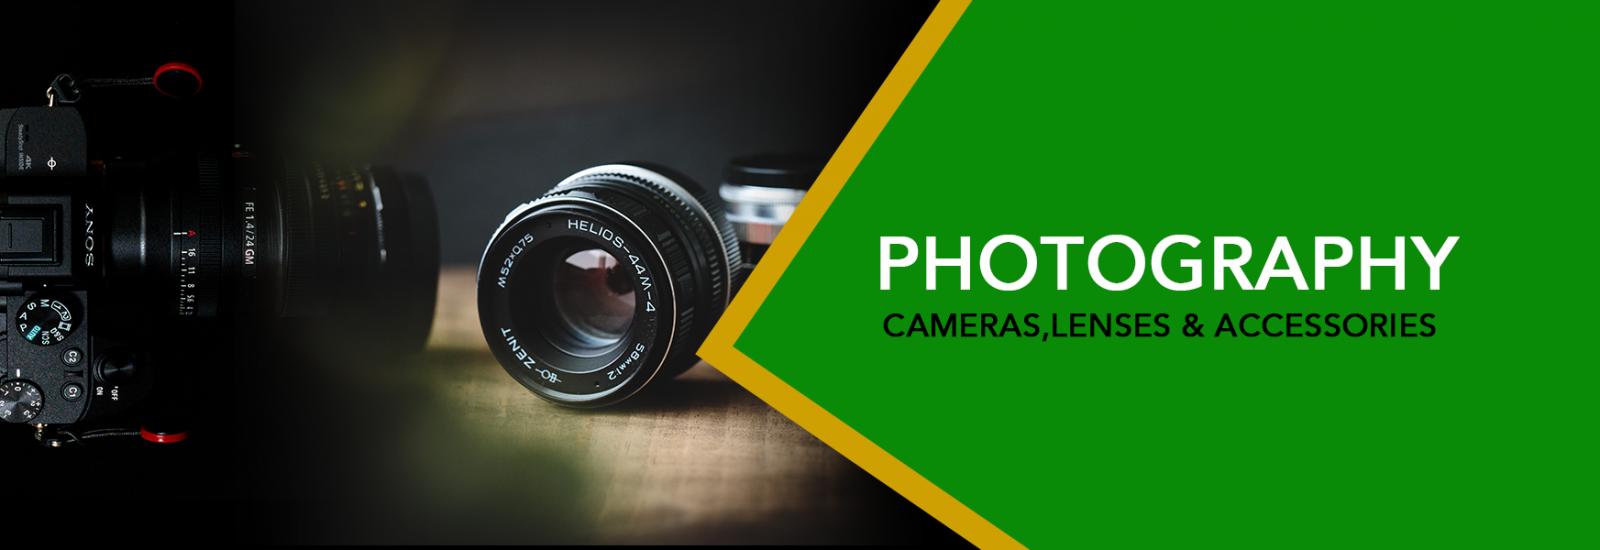 Photohraphy